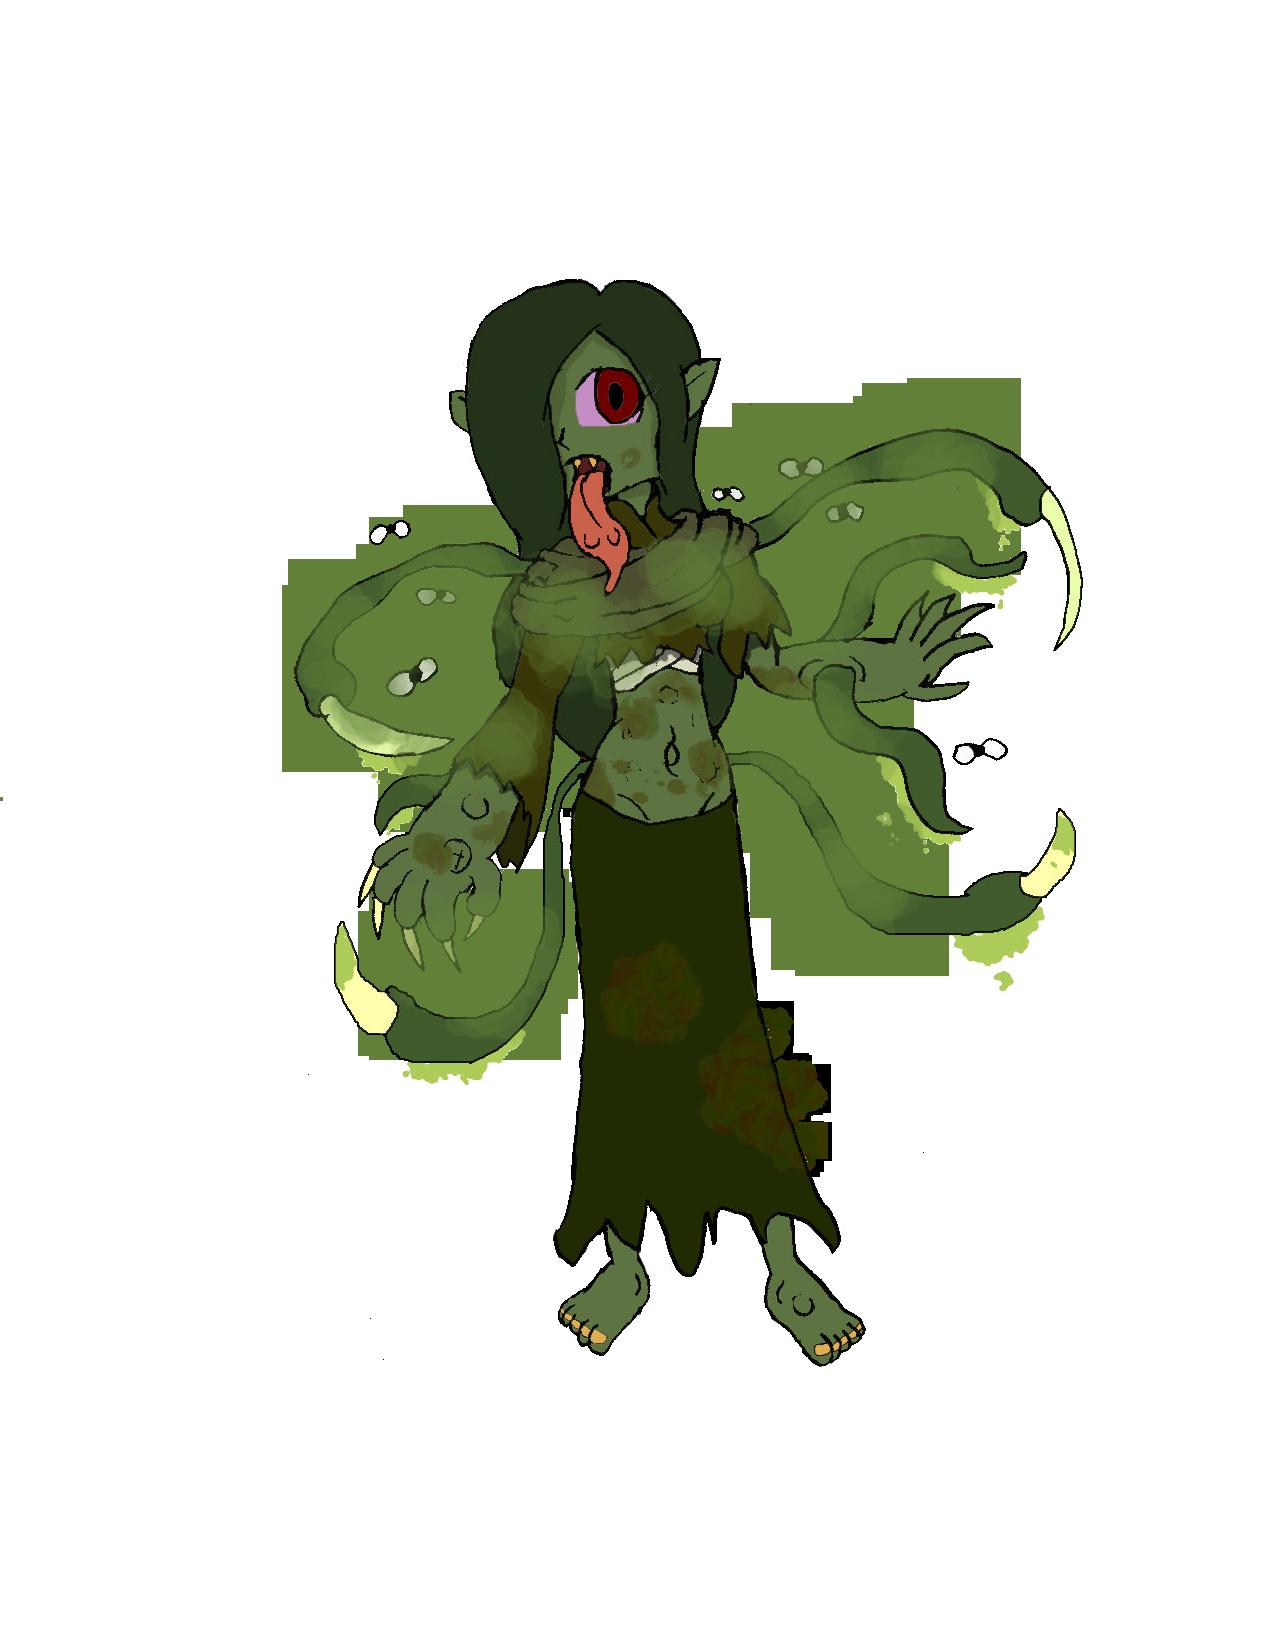 Pestilence/Plague